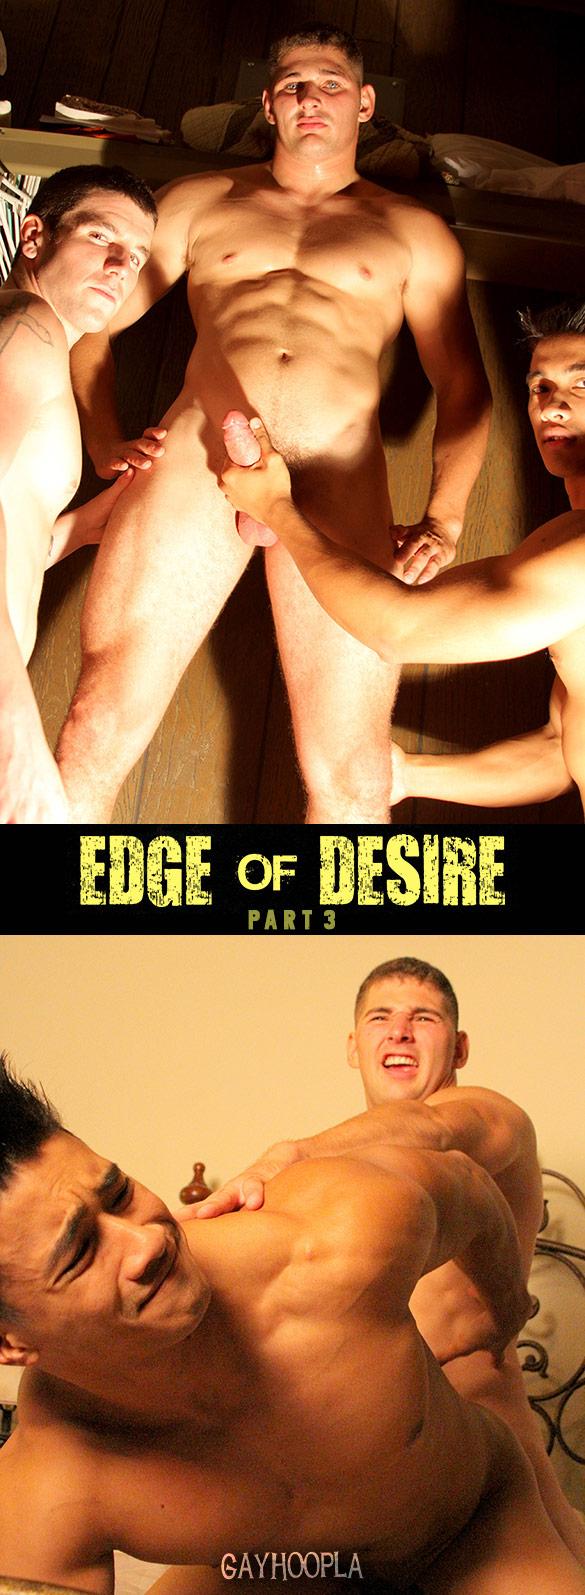 "GayHoopla: Max Summerfield fucks Ken Ott in ""Edge of Desire, Part 3"""